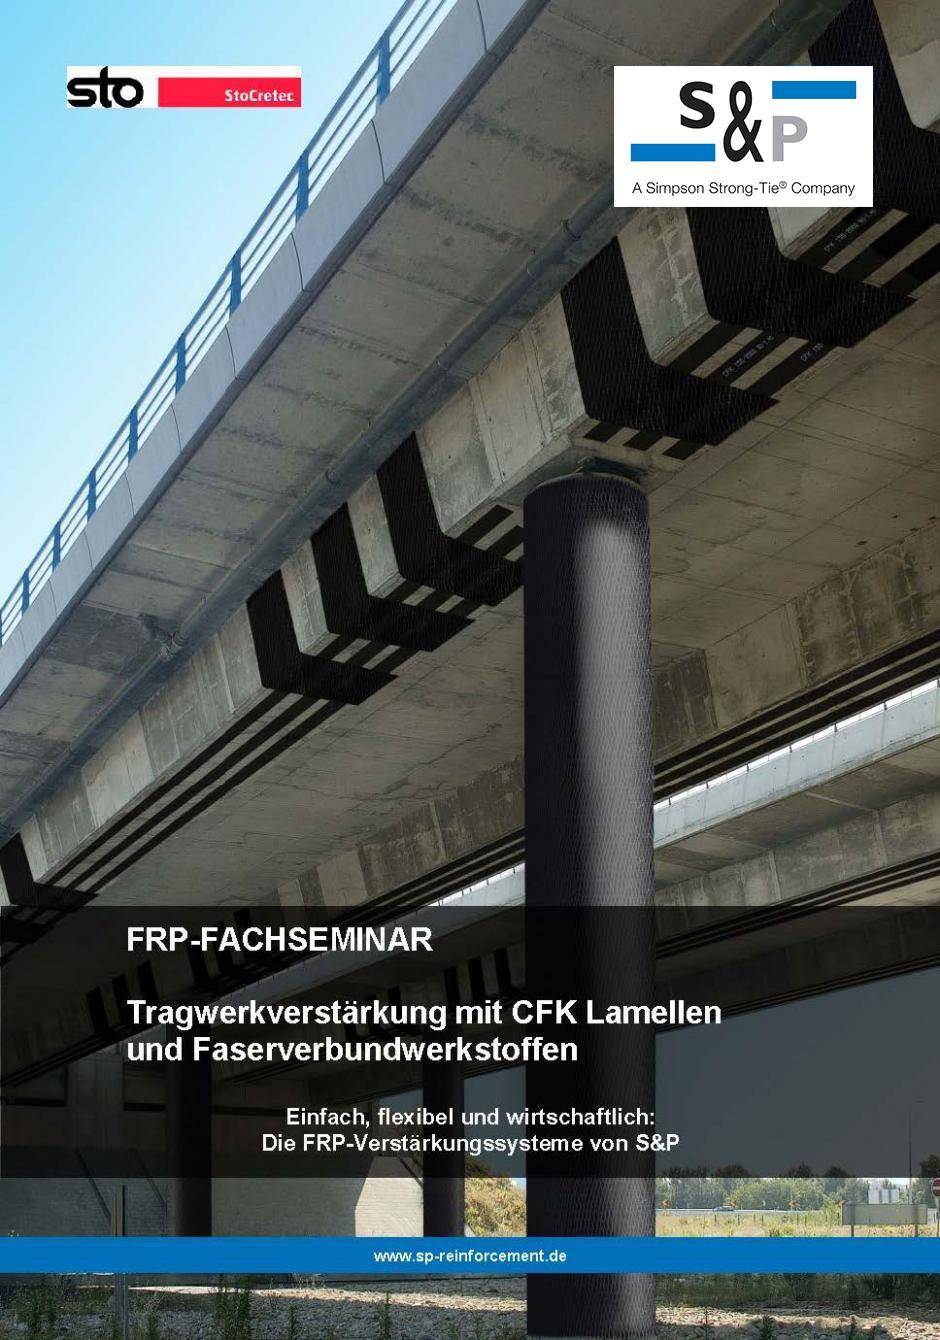 FRP Seminar in Wolfsburg